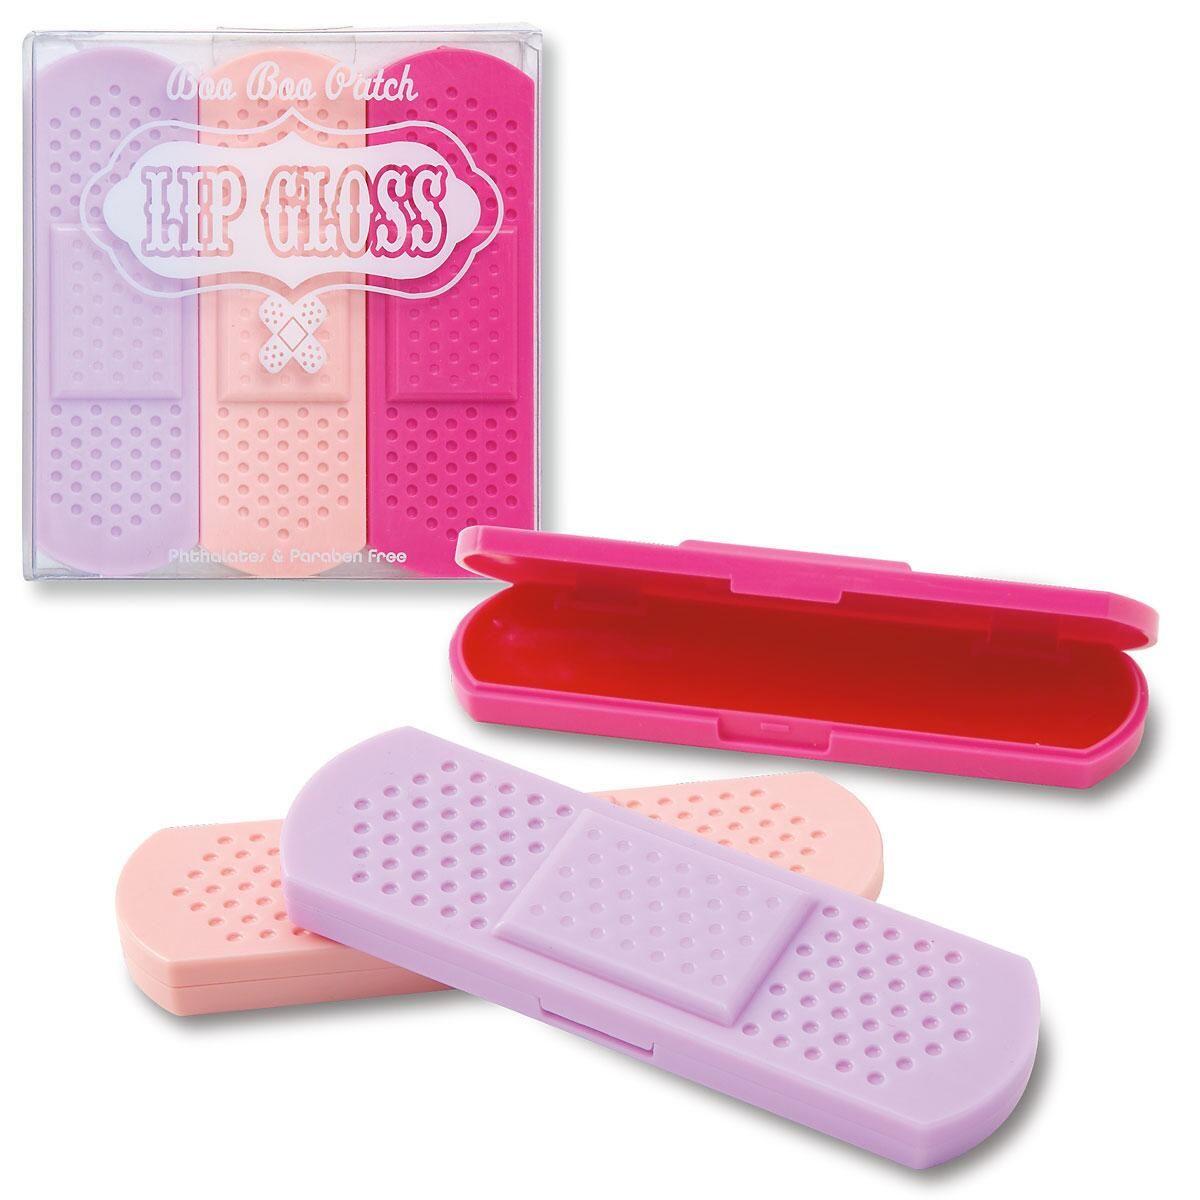 Boo-Boo Patch Lip Gloss Set